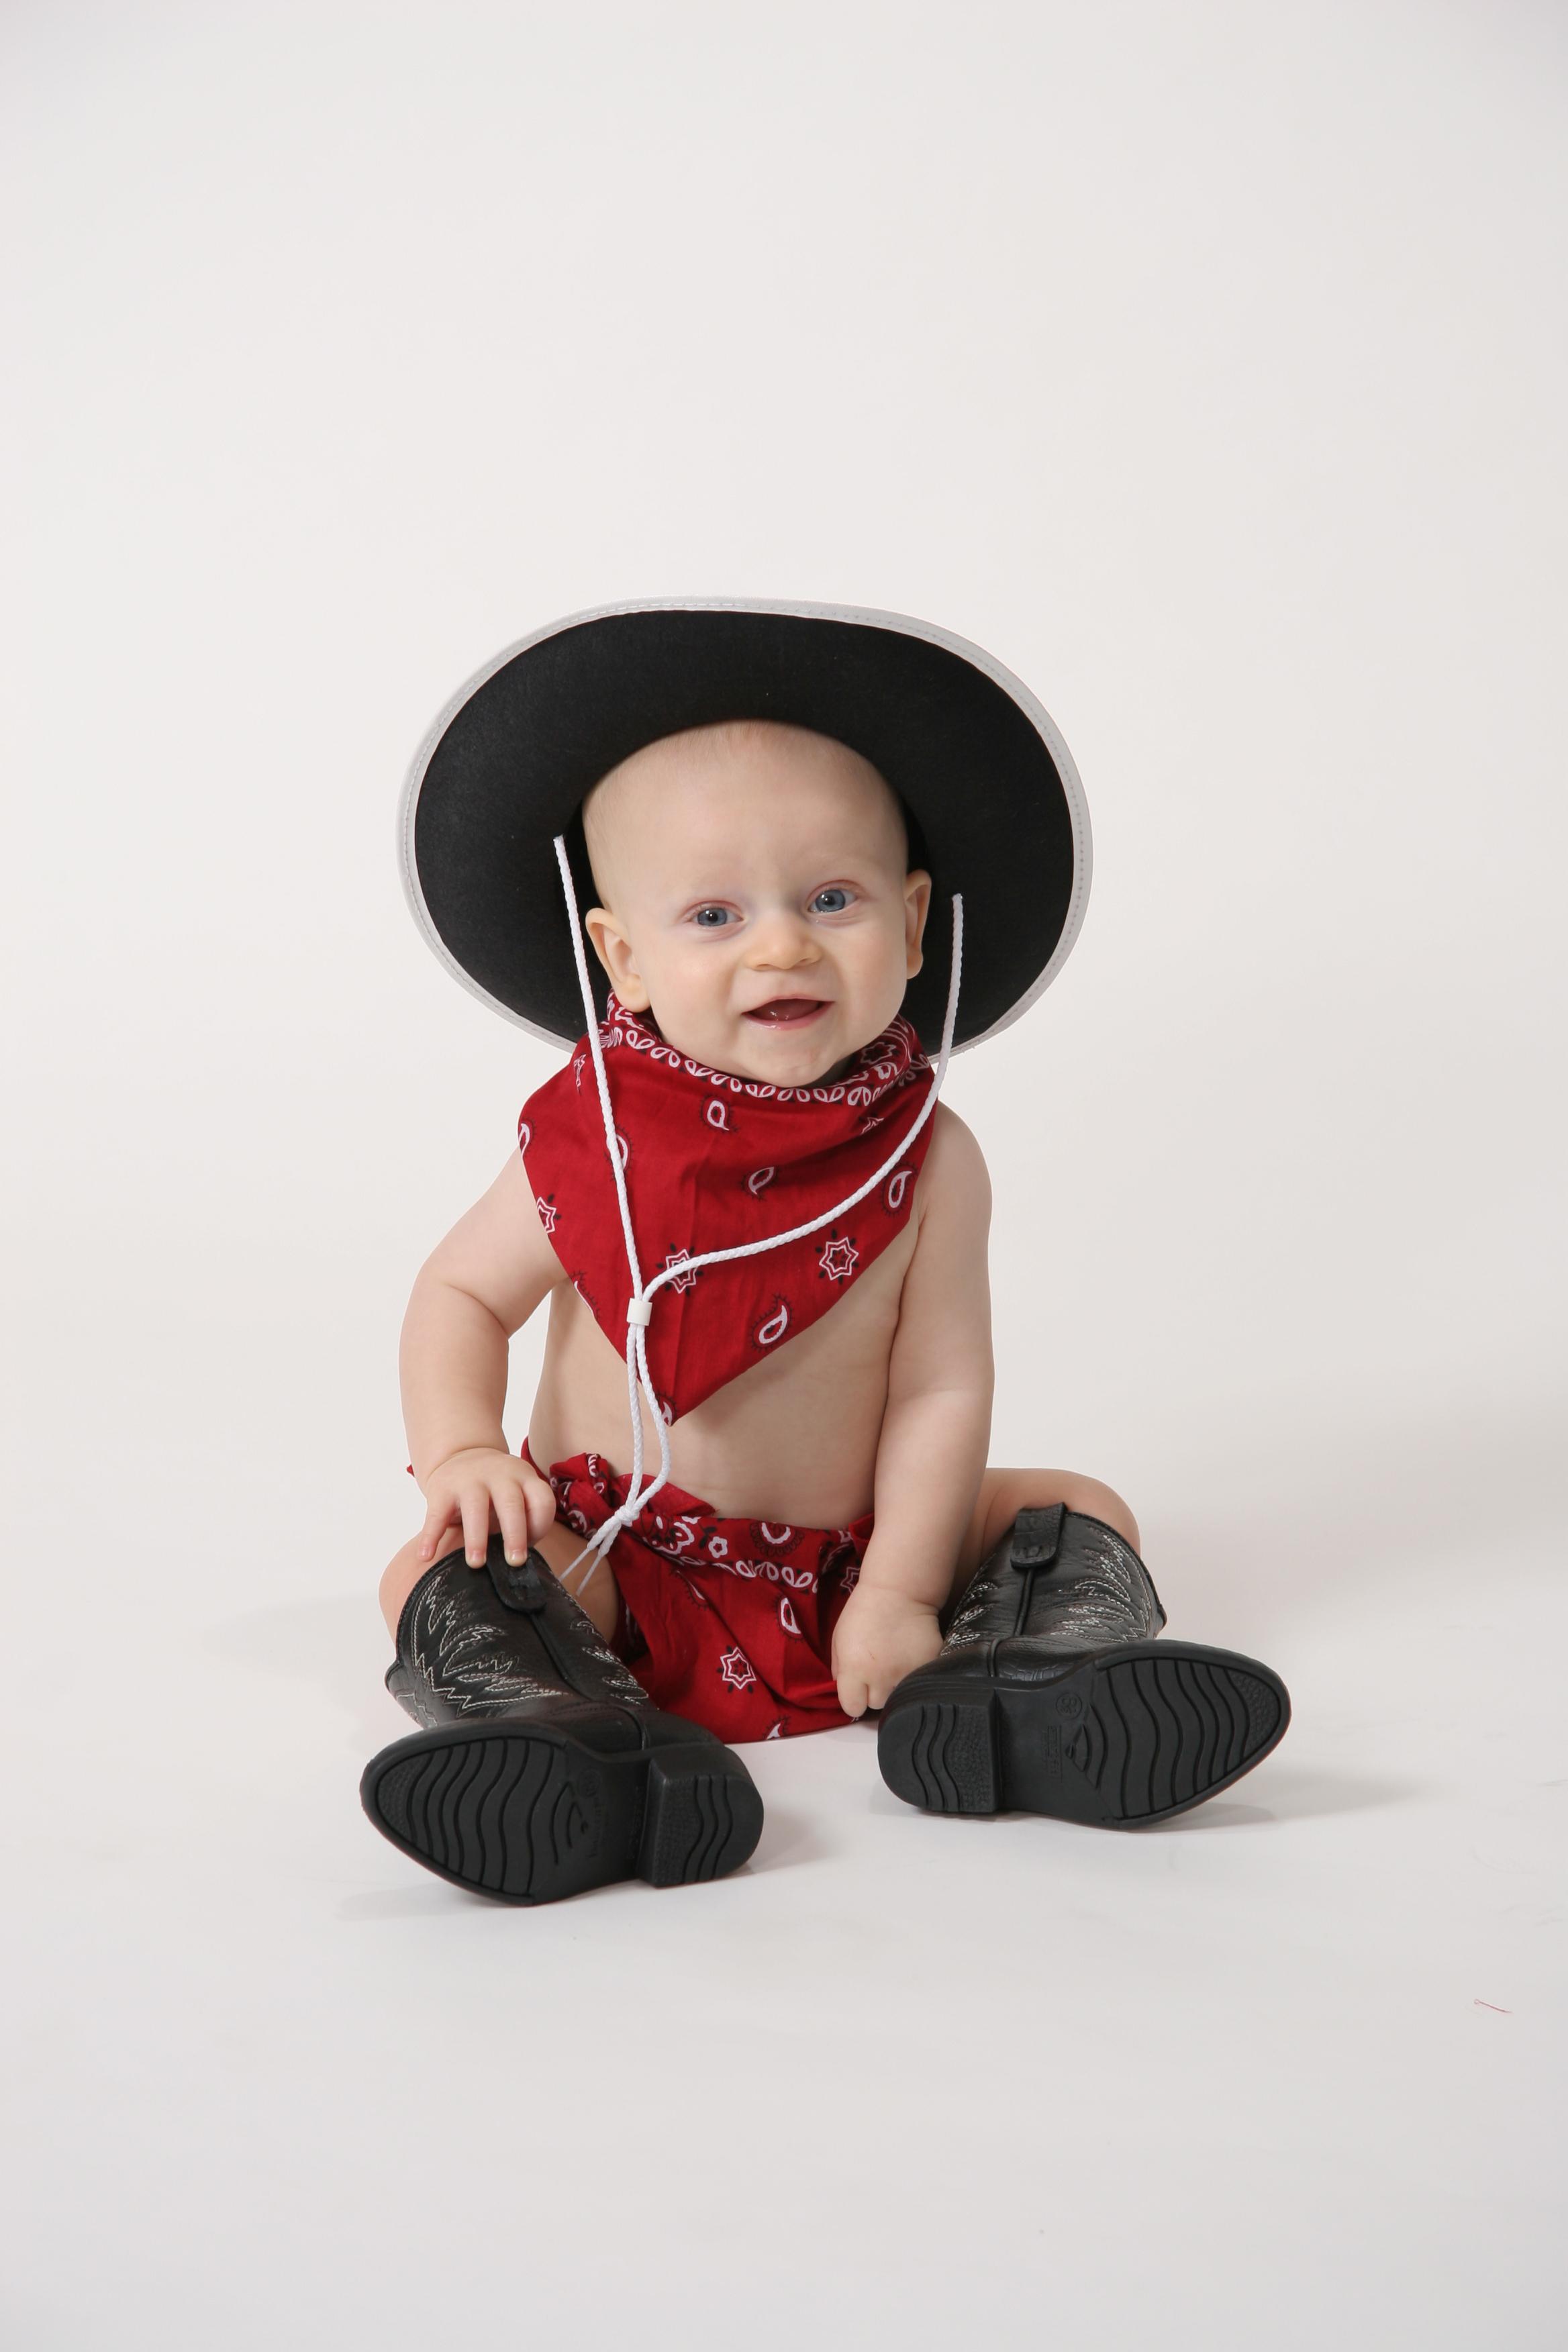 sleep-trainer-for-babies-houston-texas